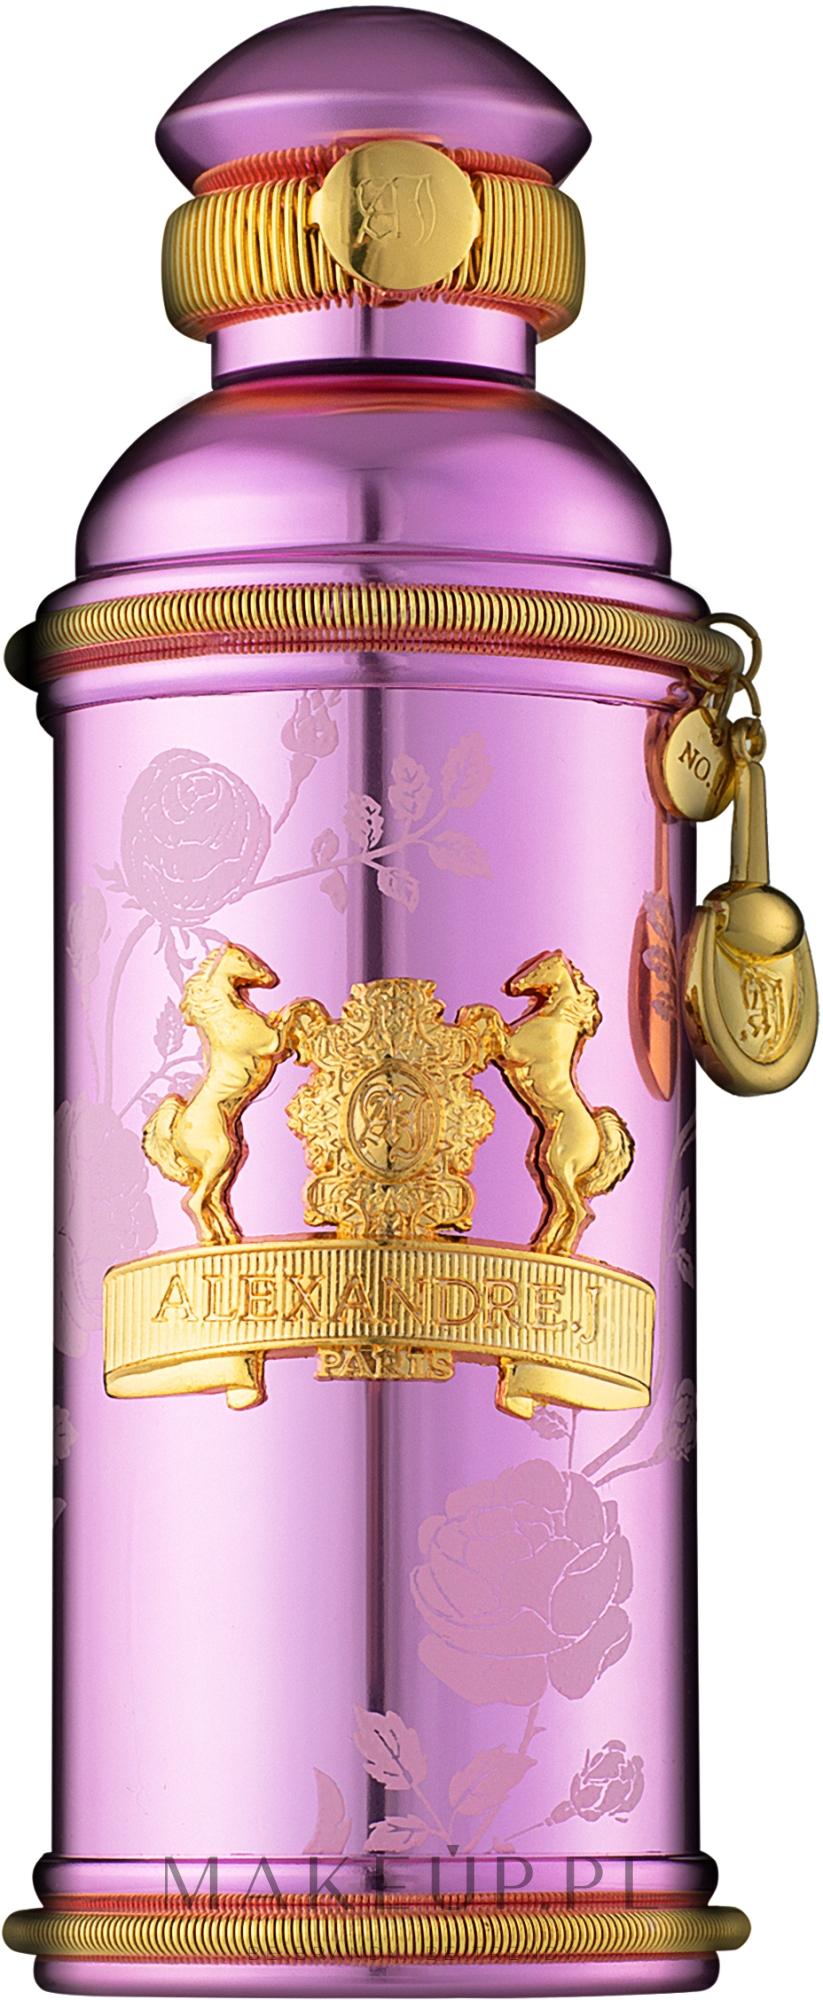 alexandre j the collector - rose oud woda perfumowana 100 ml